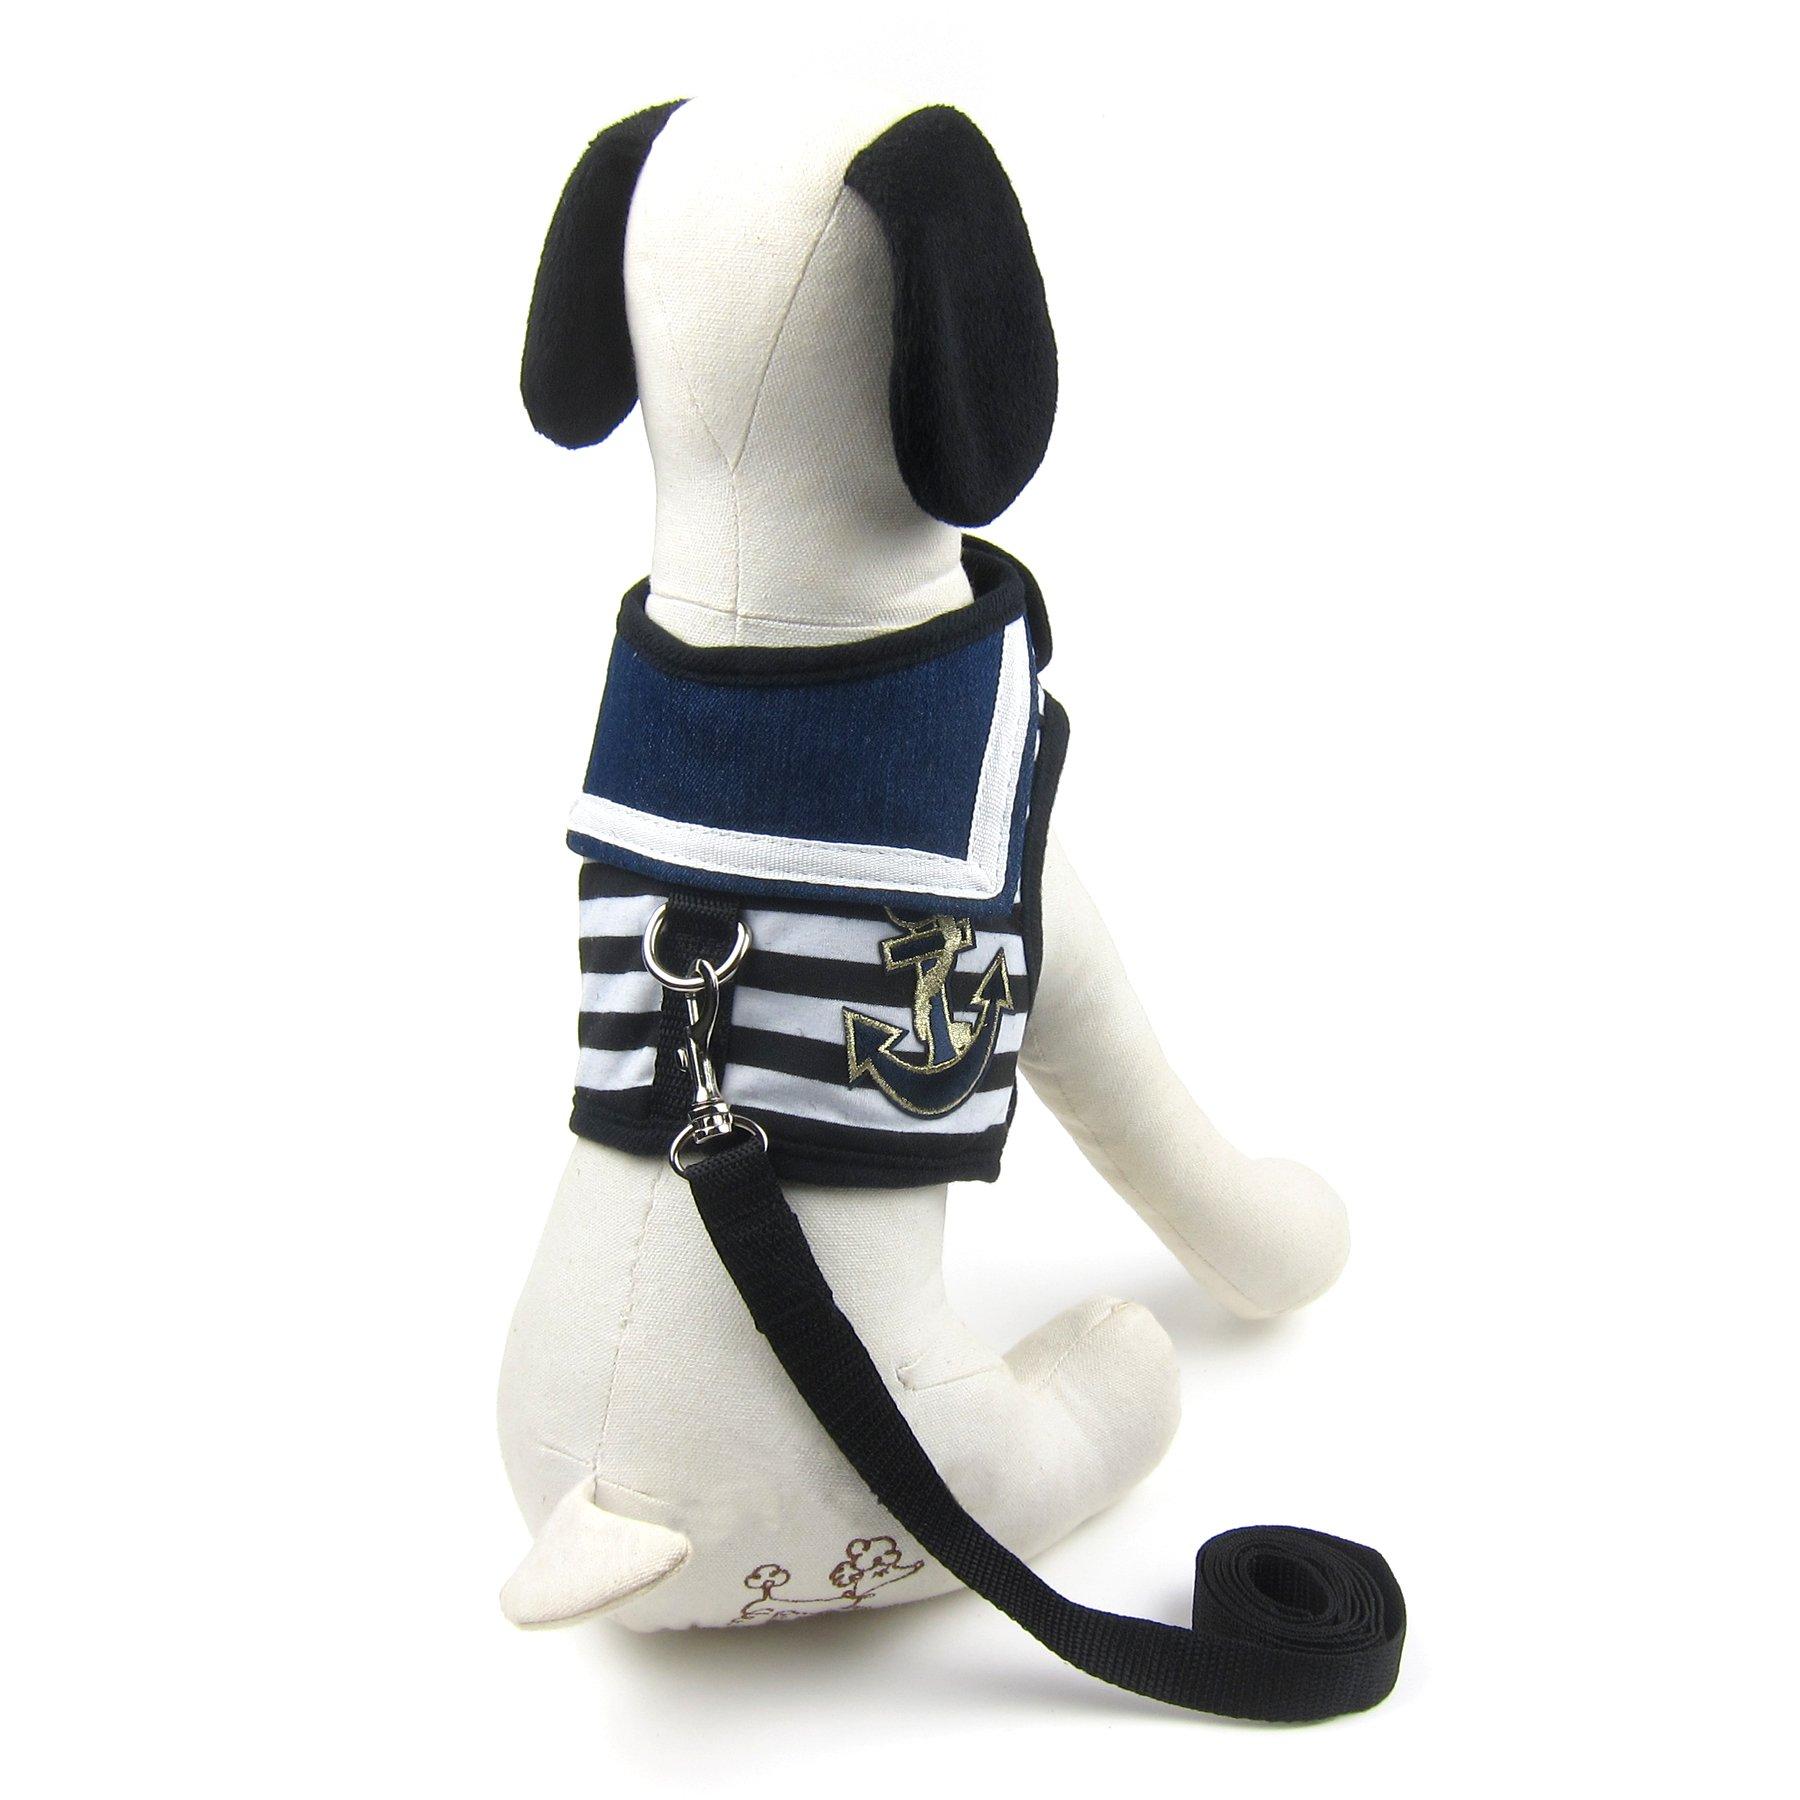 Alfie Pet by Petoga Couture - Dustin Sailor Harness and Leash Set - Color: Black Stripe, Size: Small